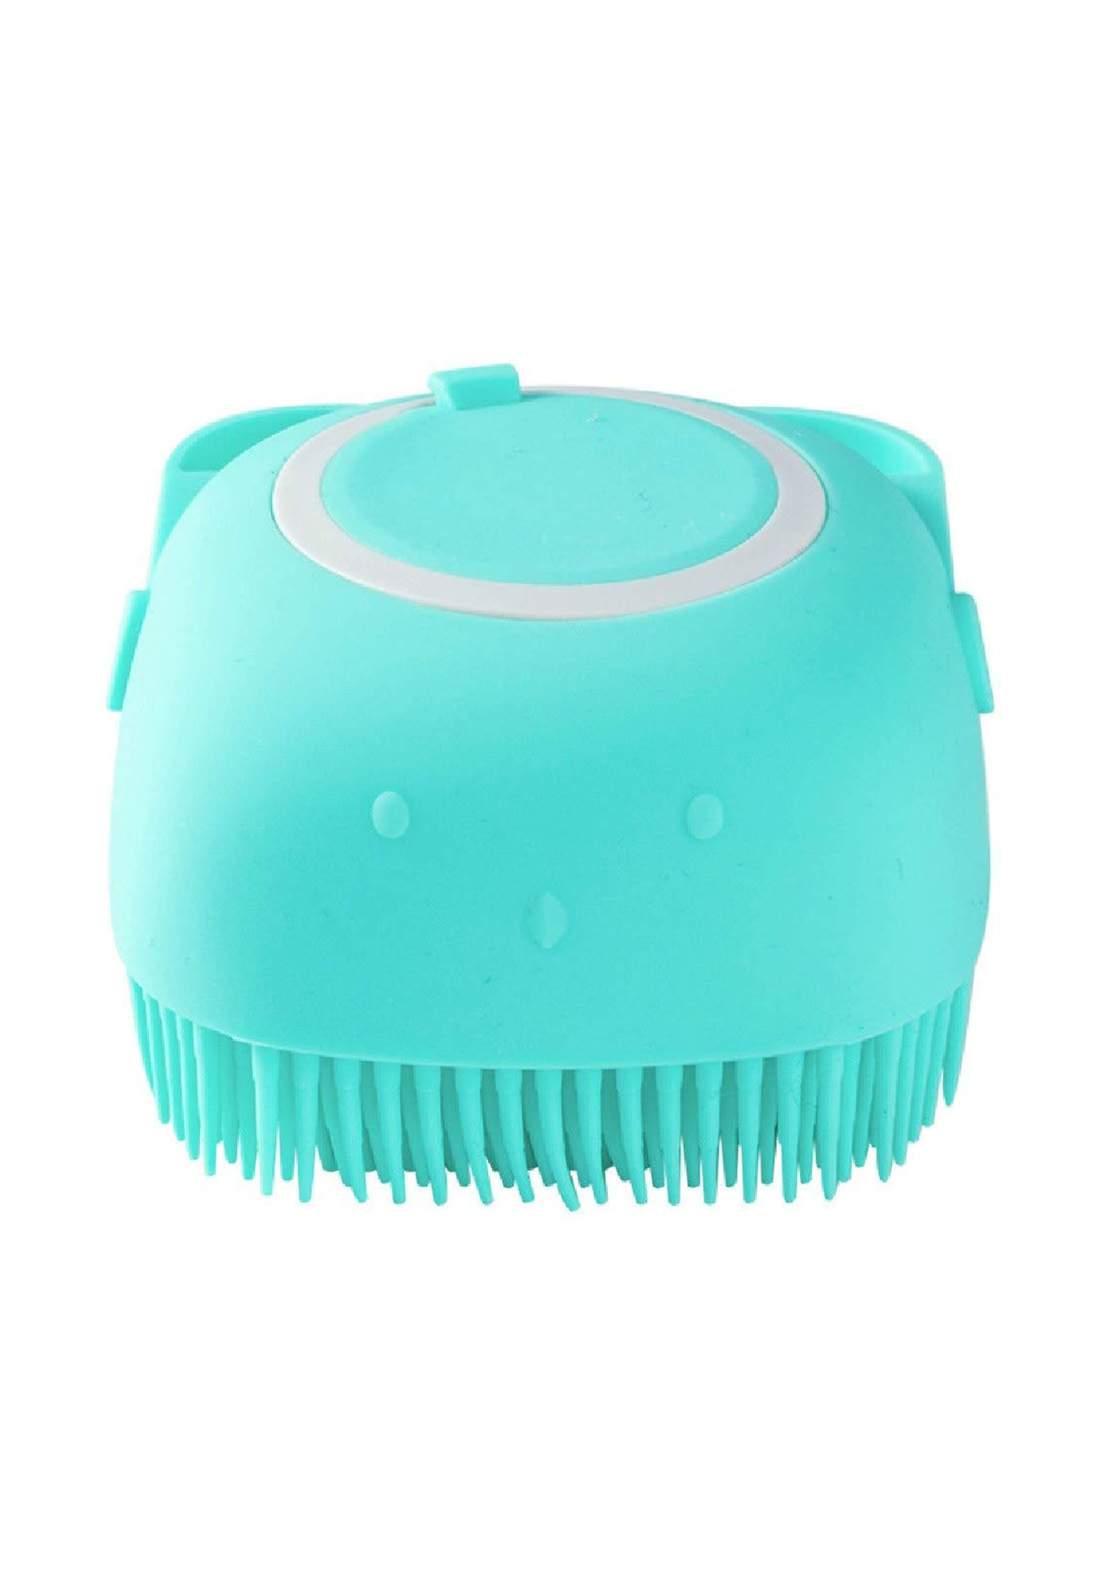 Silicone Massage Bath Brush فرشاة الاستحمام